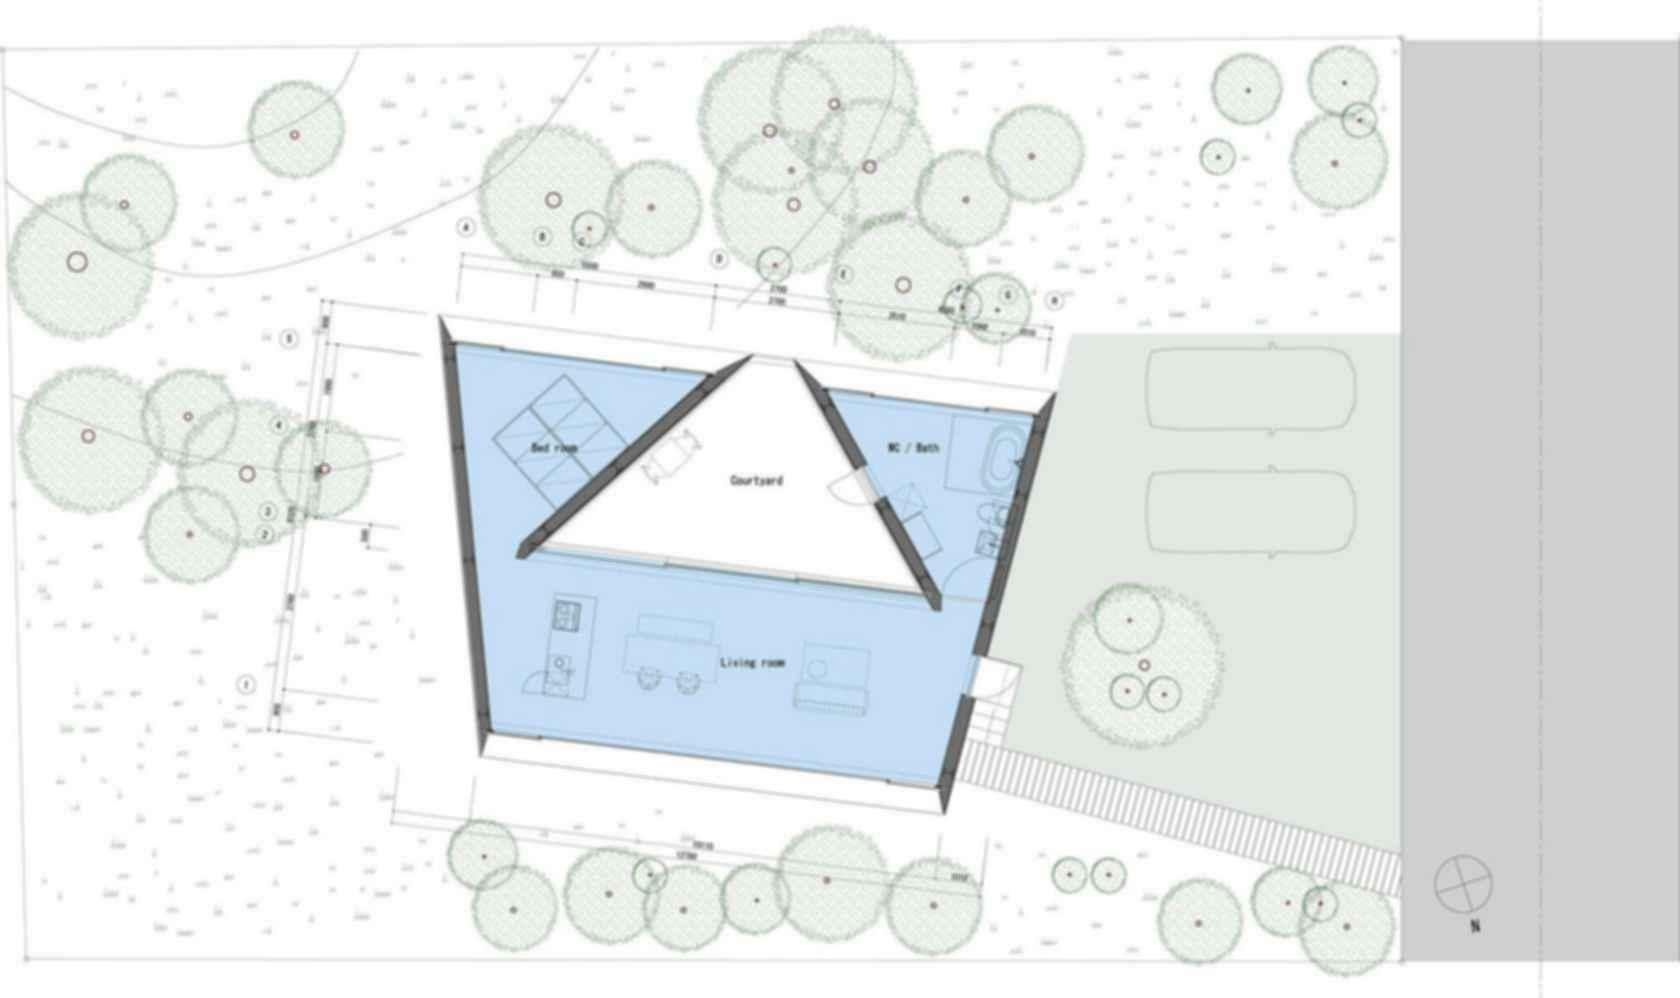 Forest Bath House - Site Plan